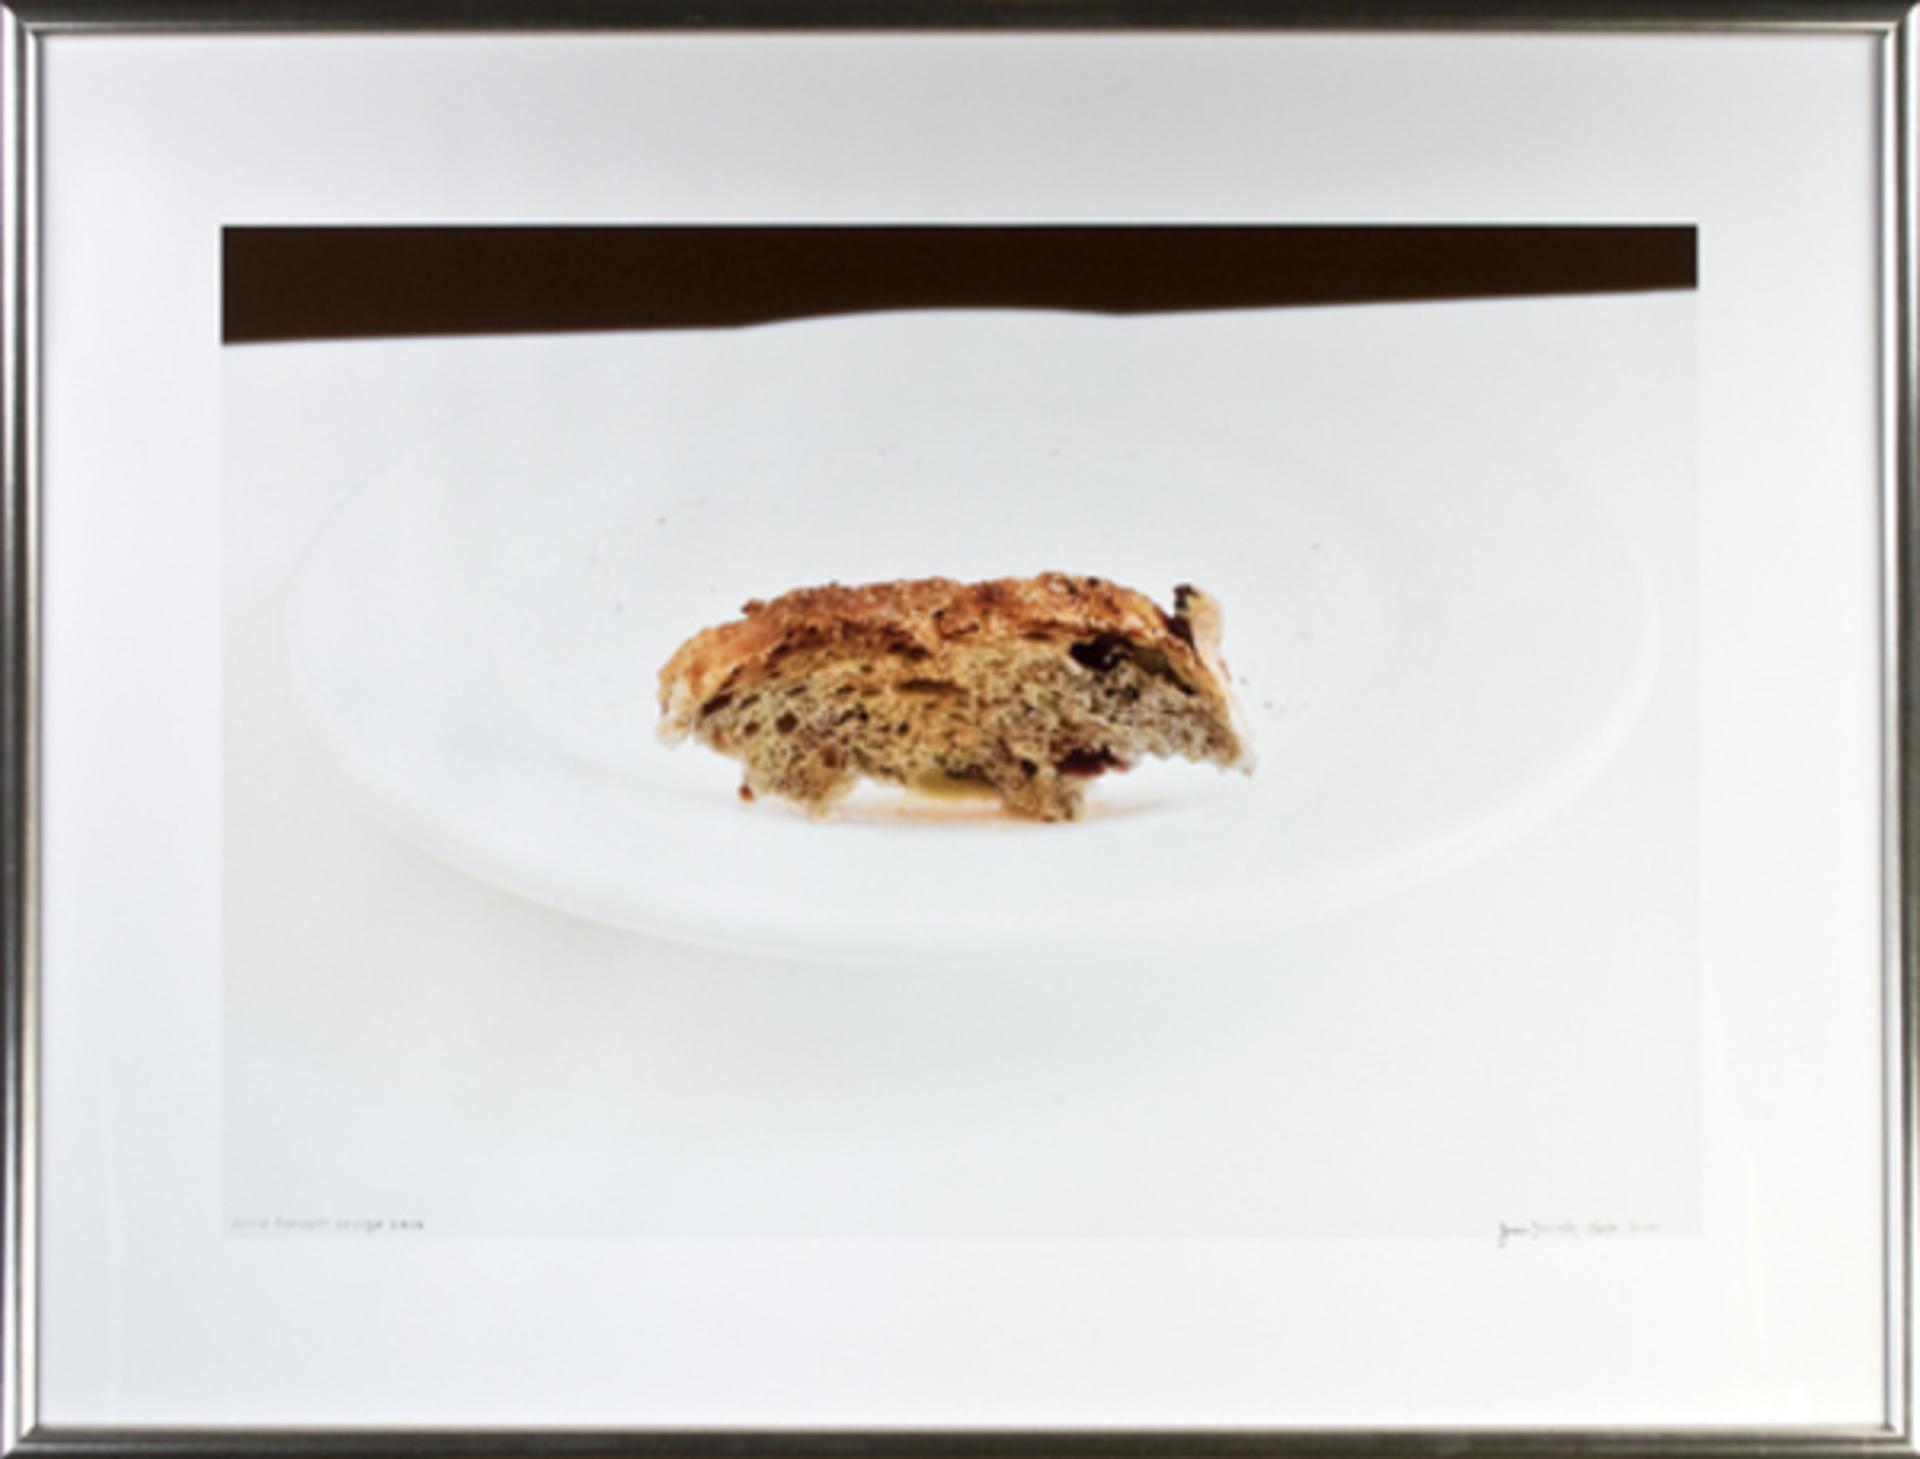 Bread Mouse by David Barnett & Joan Dvorsky